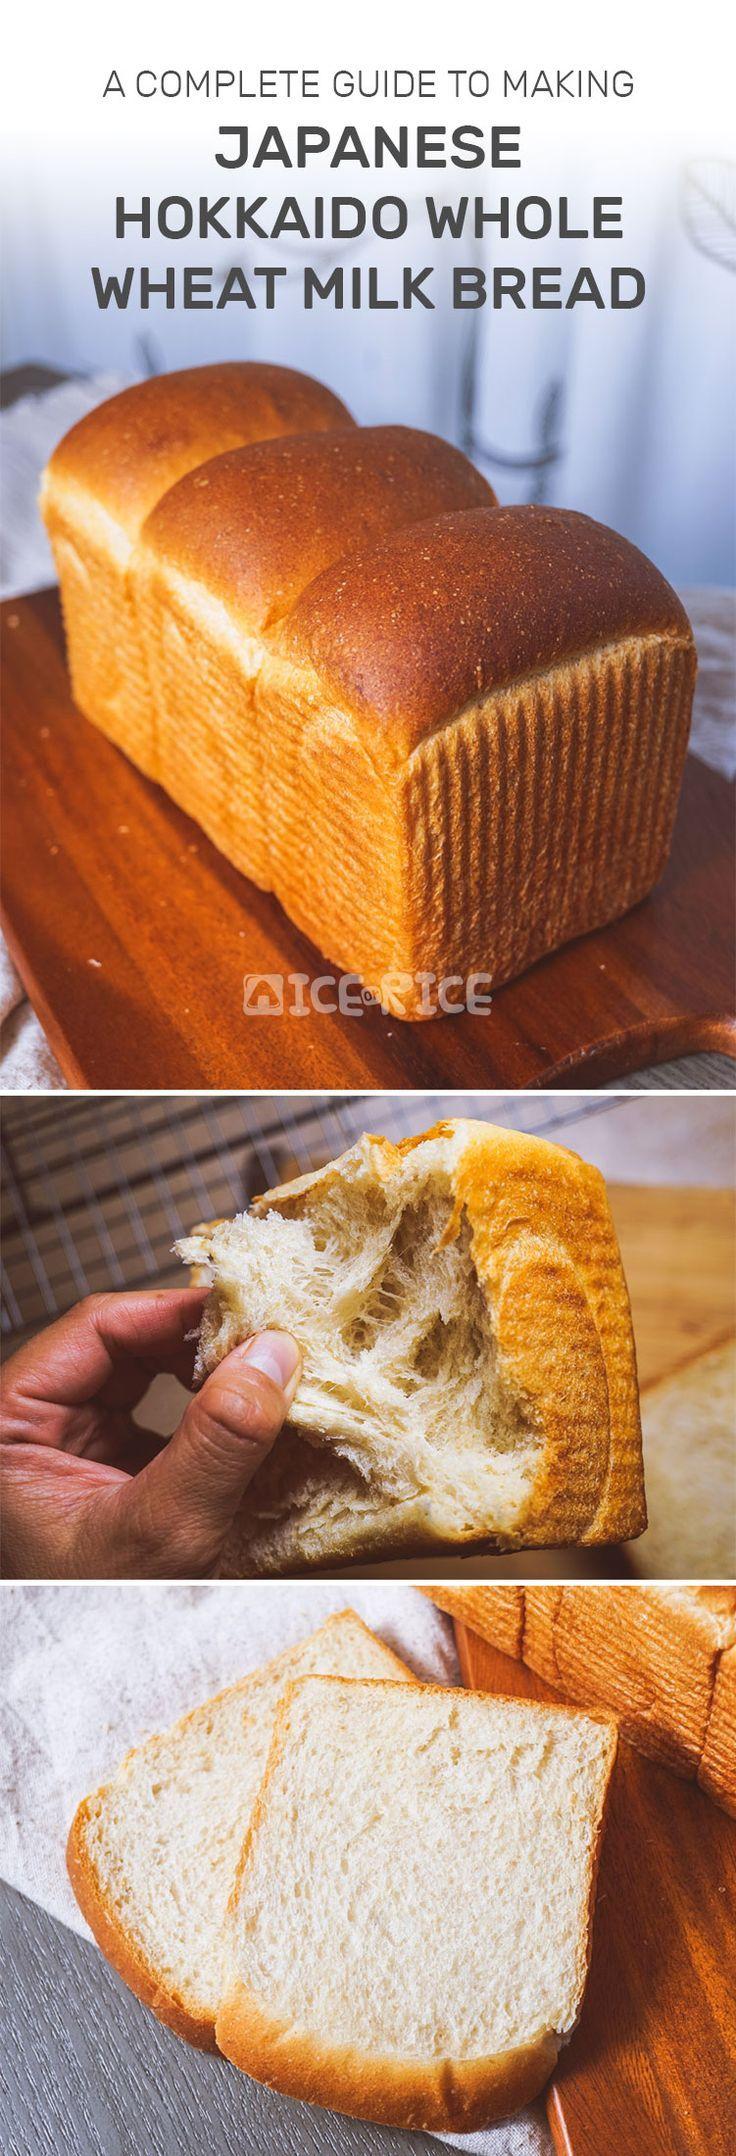 Japanese Hokkaido Whole Wheat Milk Bread | Recipe | Milk ...